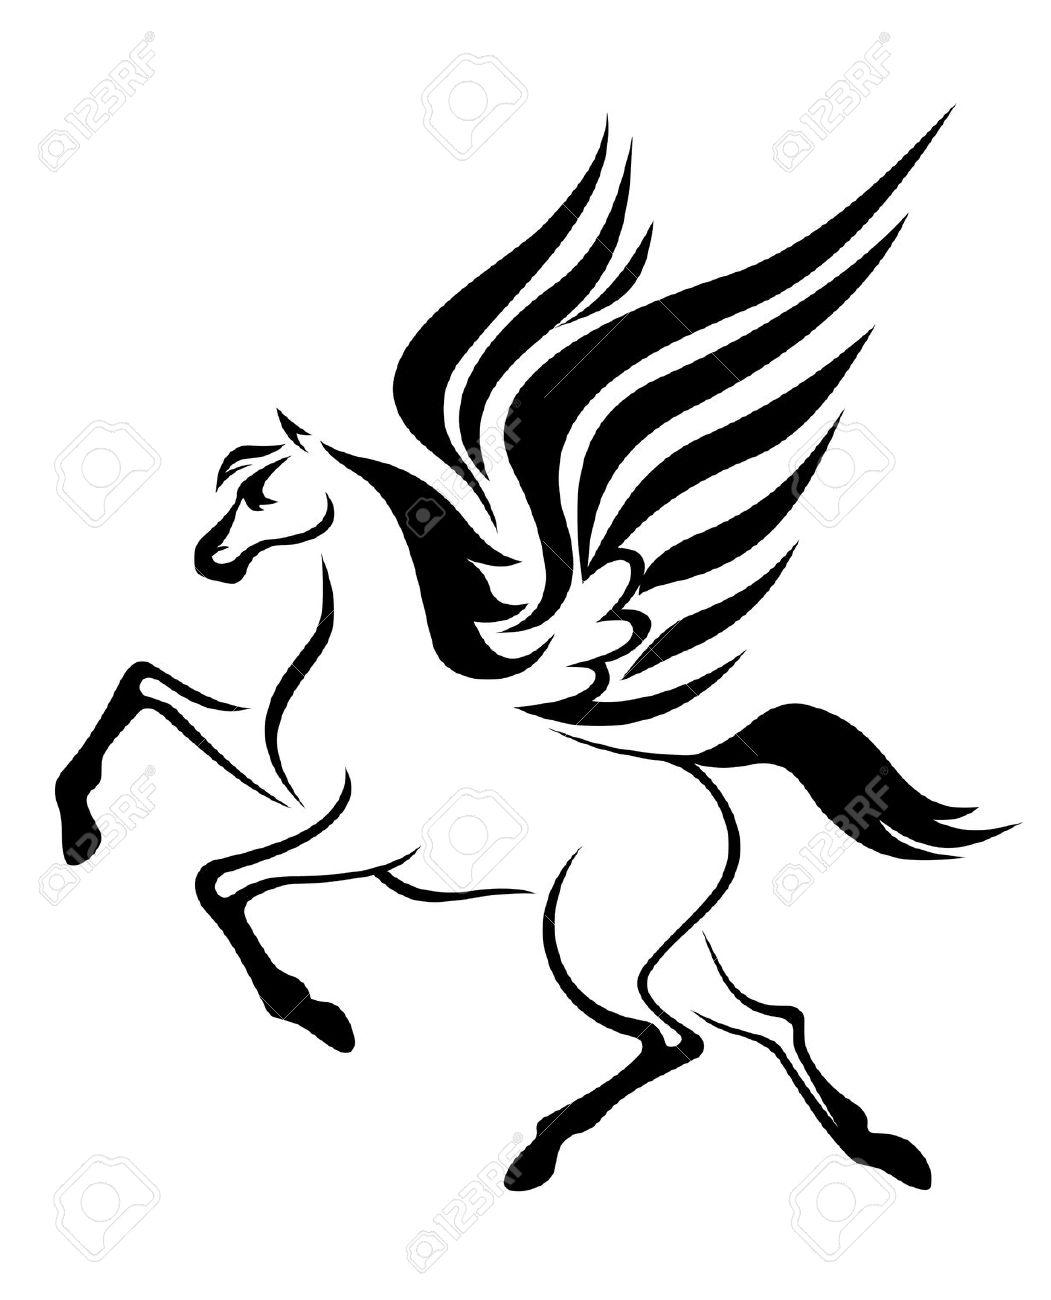 Pegasus flying clipart.